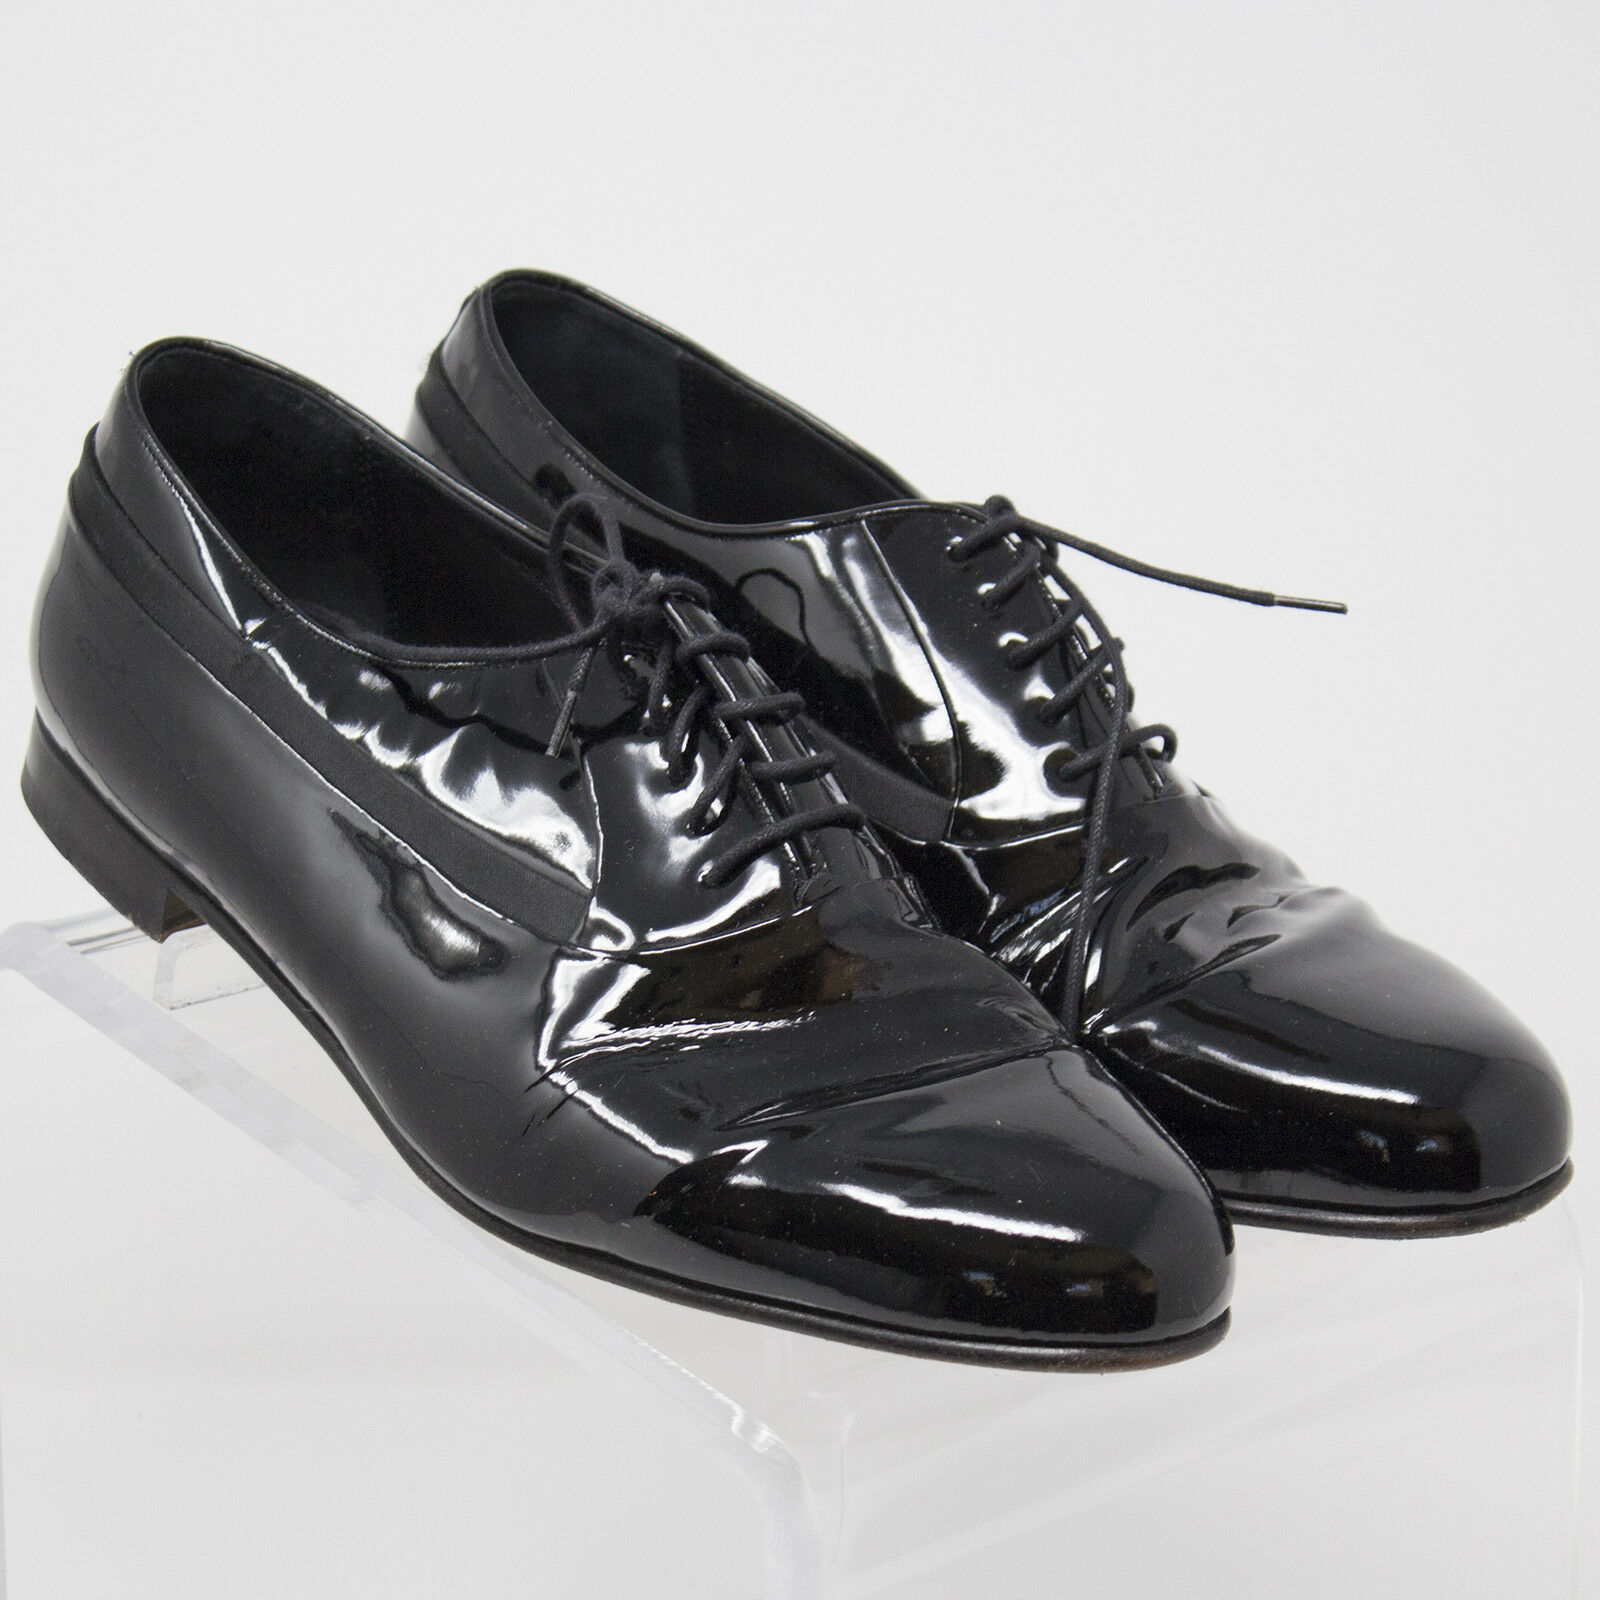 saldi Mezlan Broadway Broadway Broadway Formal nero Patent Leather Oxford scarpe US 10.5 W Spain 18459  spedizione veloce a te